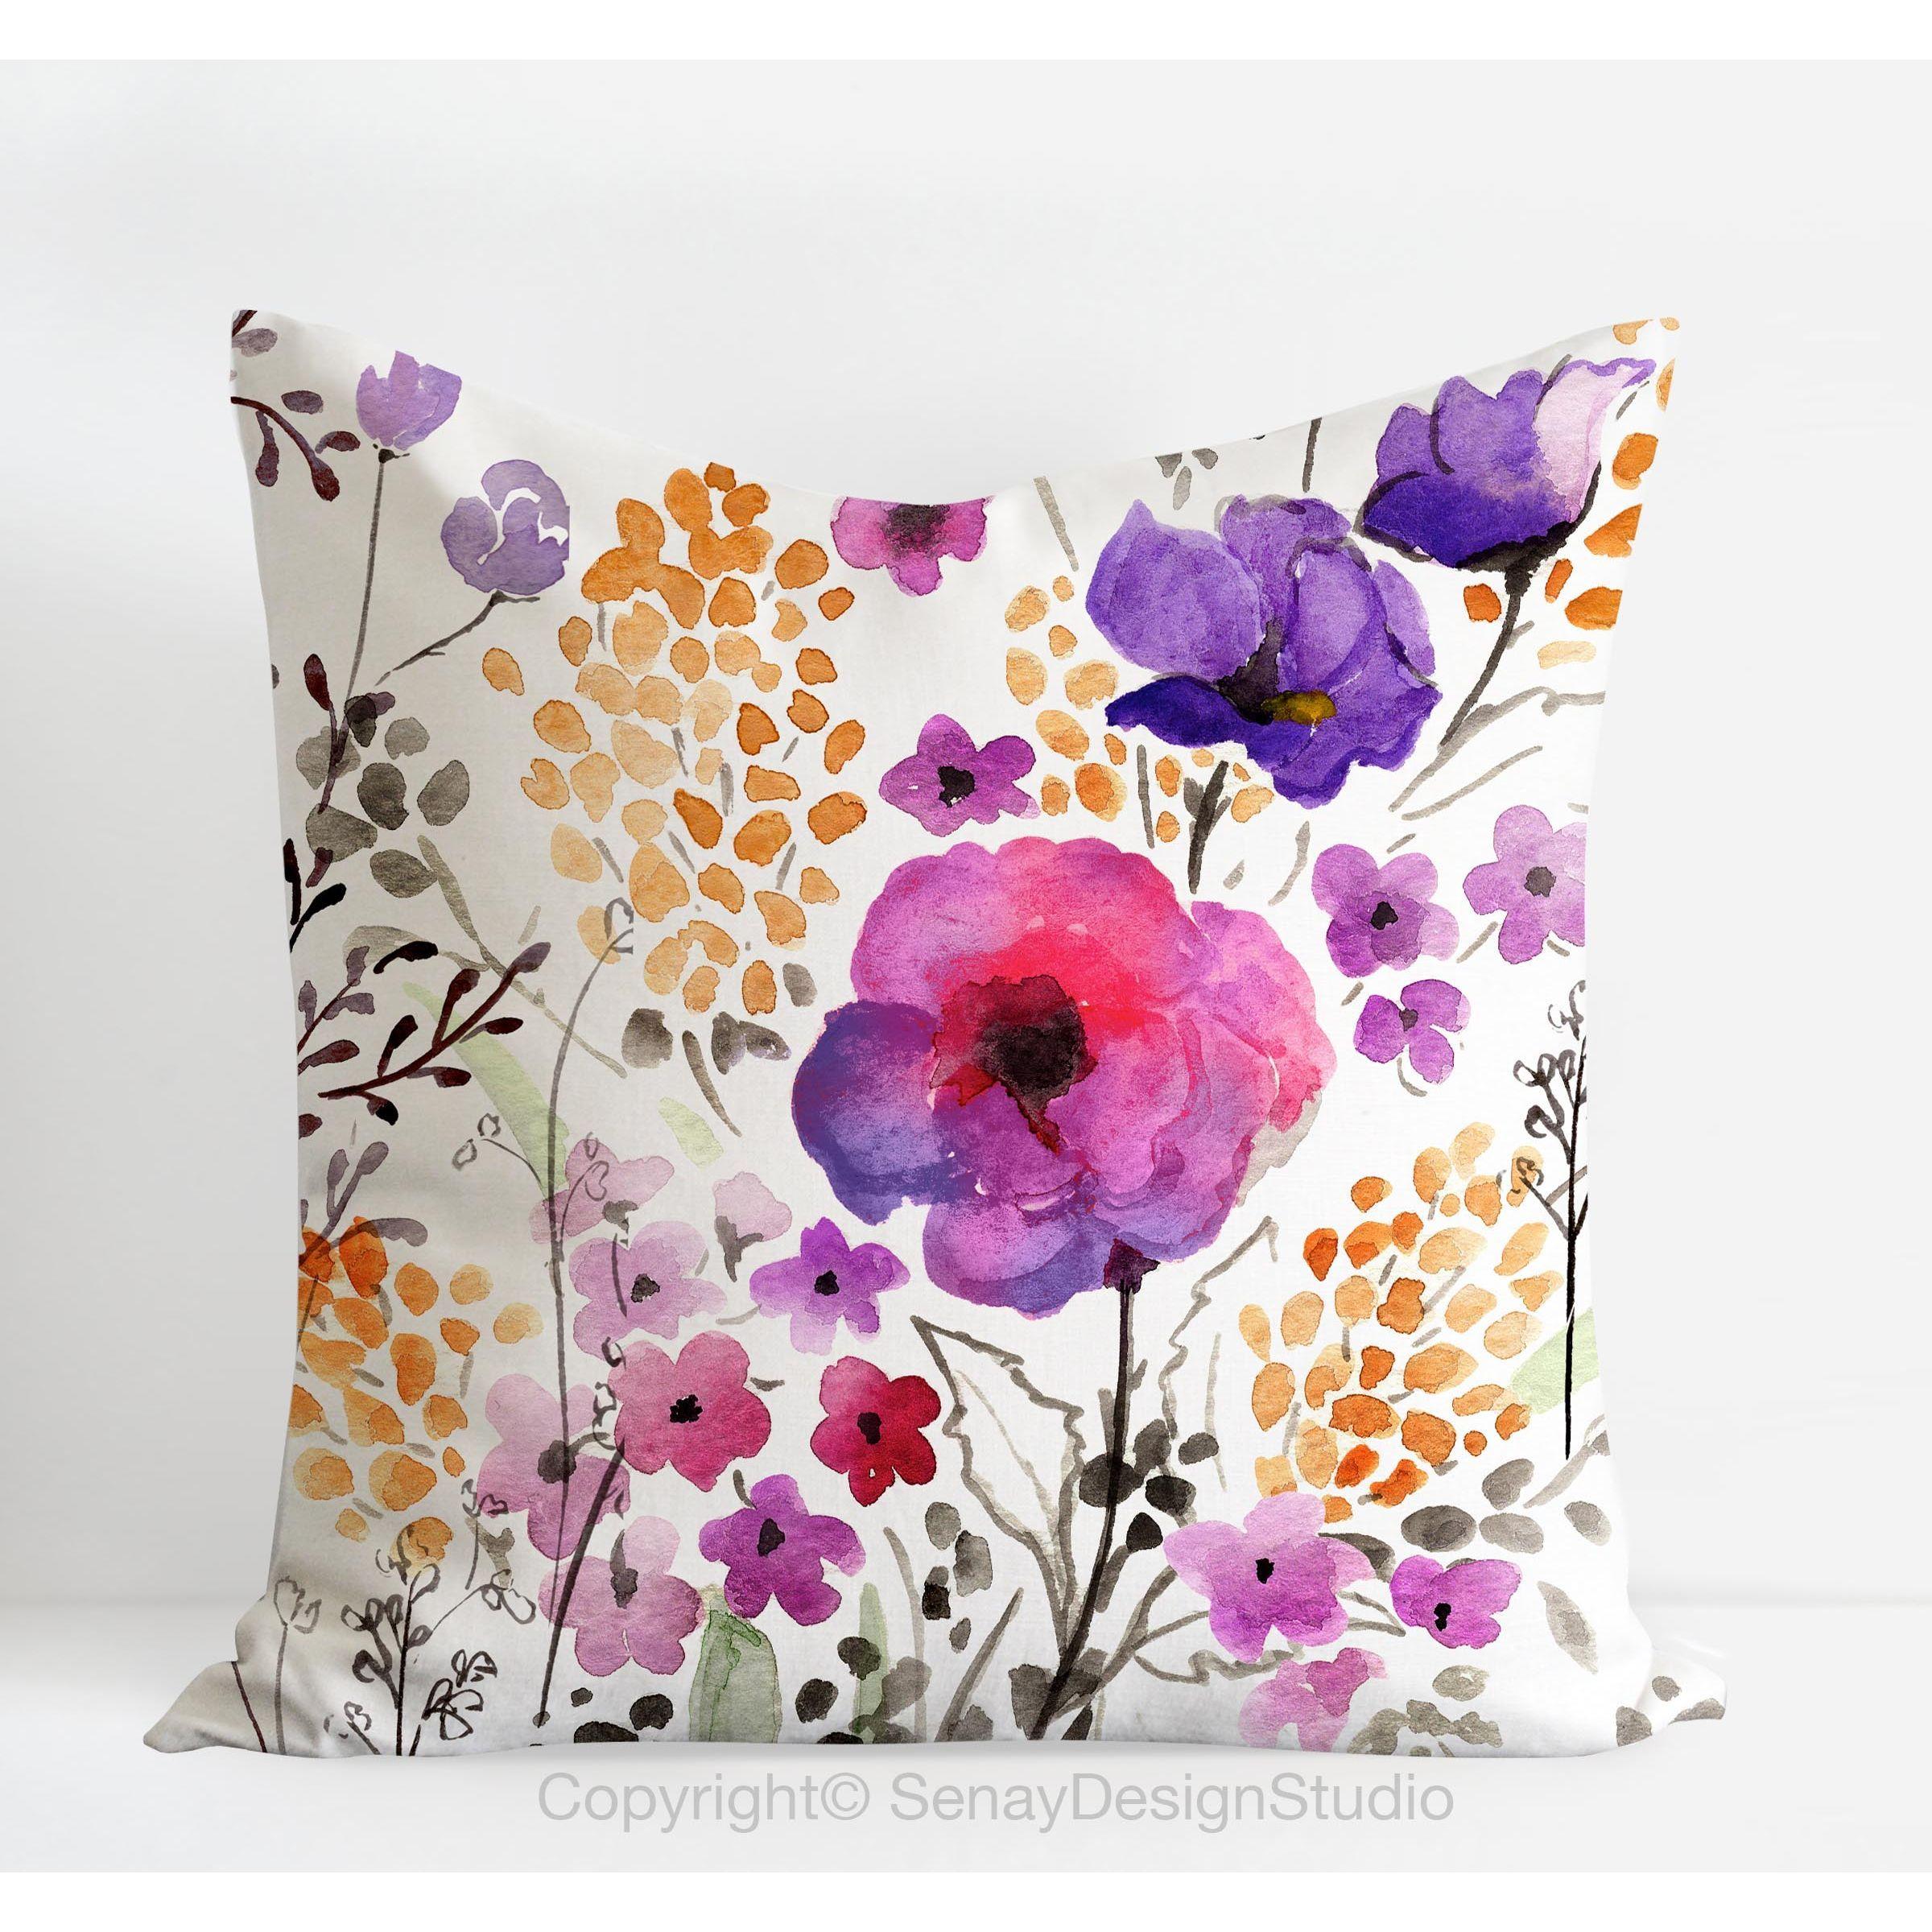 Materials textiles garden flowers floral original design